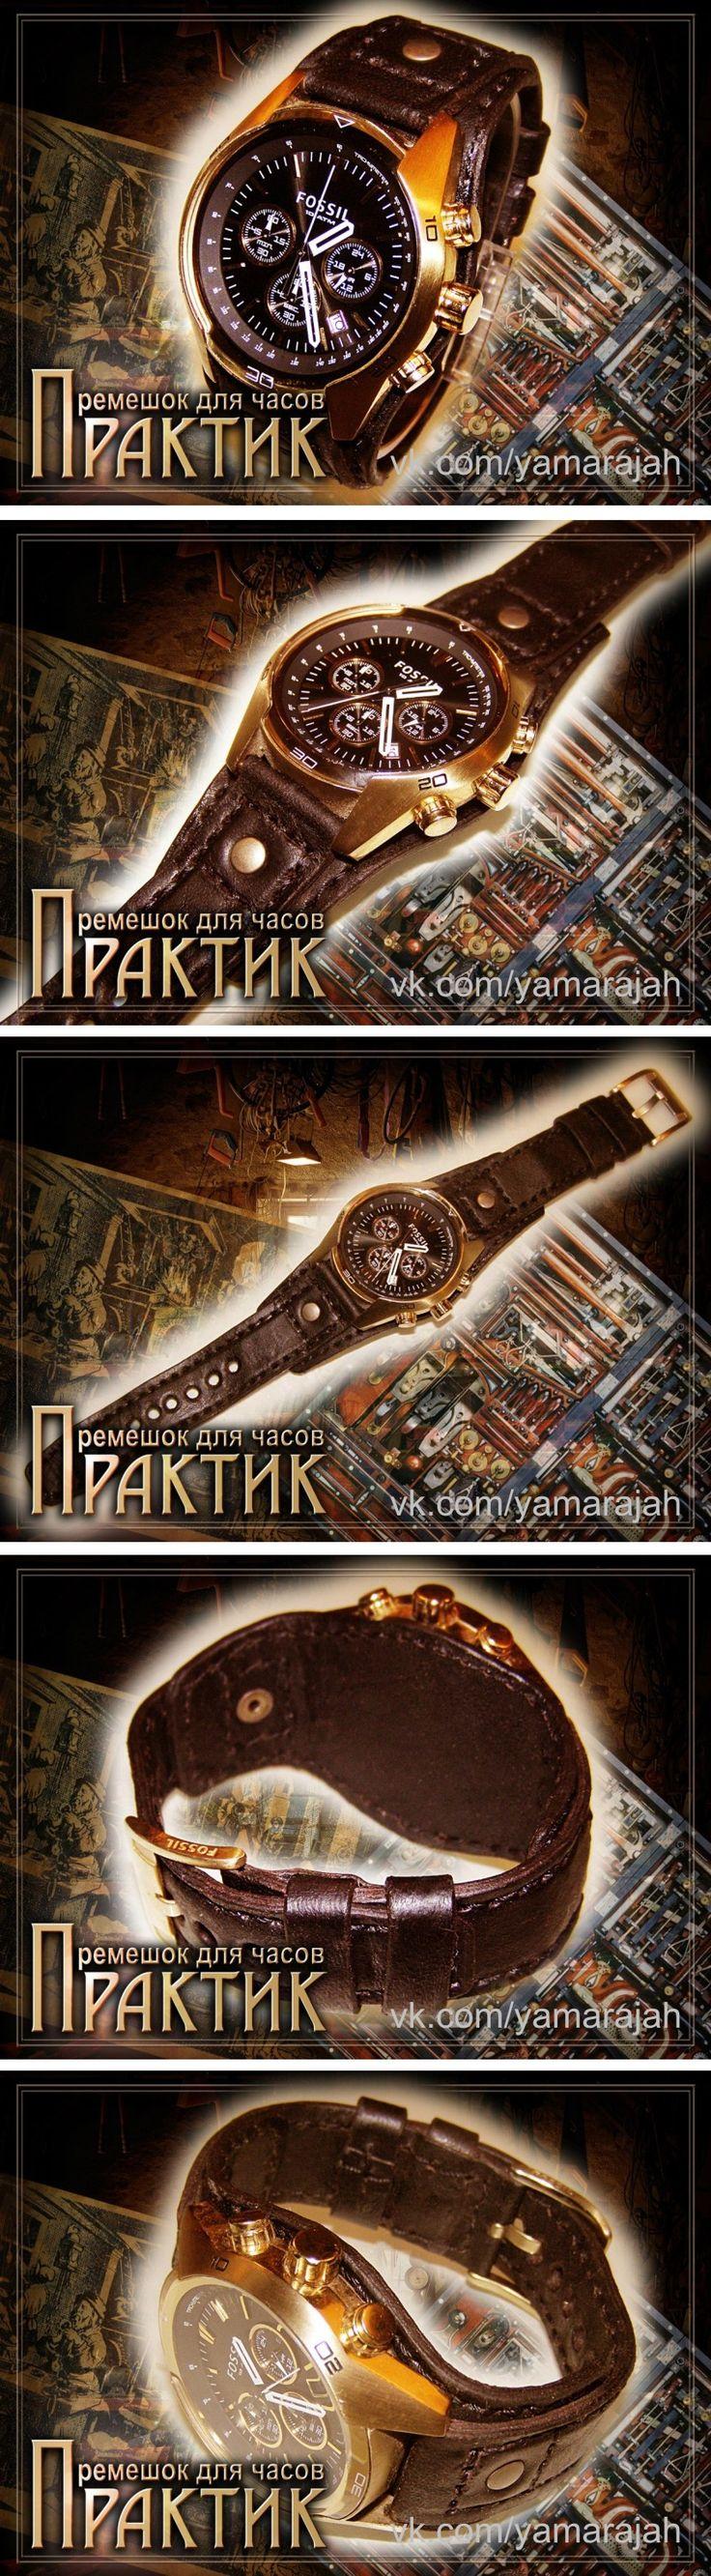 Watchband #Fossil. Cow leather, lining, waxed thread firmware in two needles. brass fittings Ремешок для часов #Fossil. Телячья кожа, подклад, прошивка вощеной нитью в две иглы. Фурнитура латунь